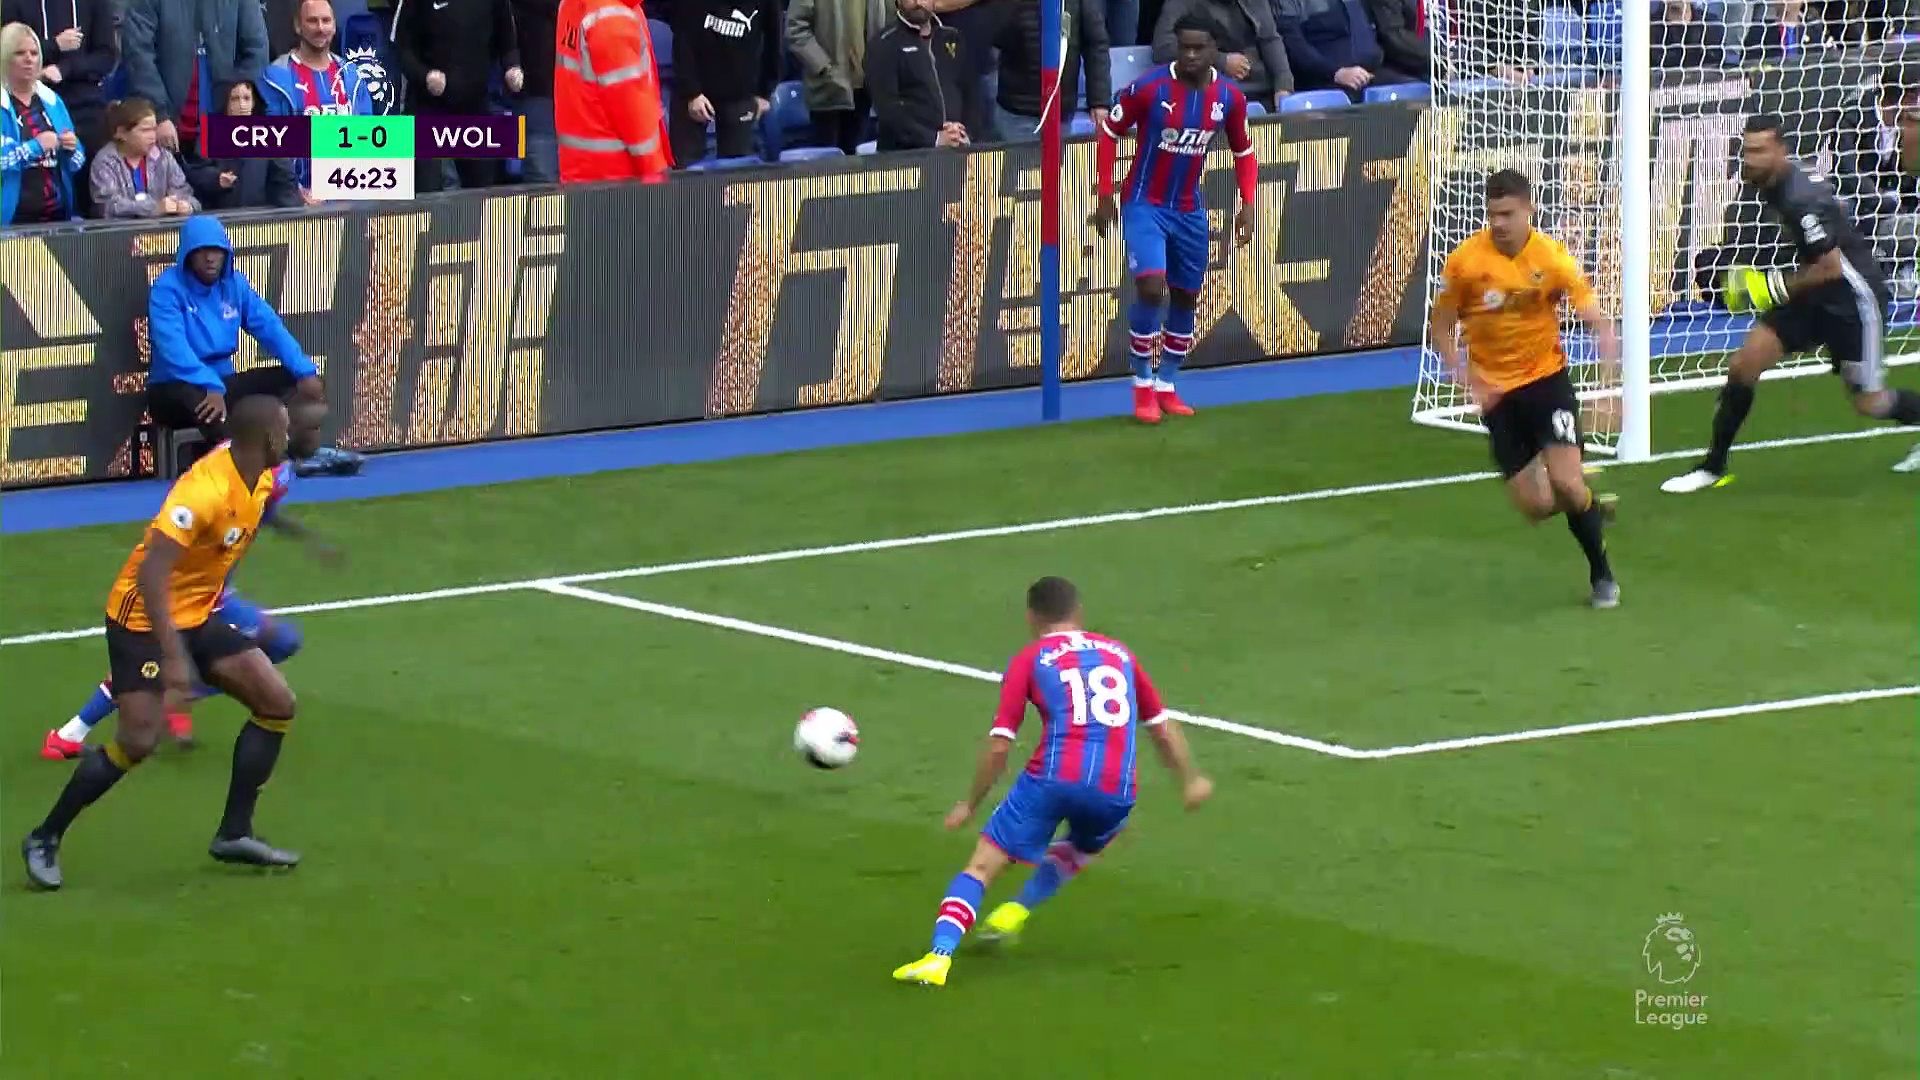 6. Hafta / Crystal Palace - Wolverhampton: 1-1 (Özet)